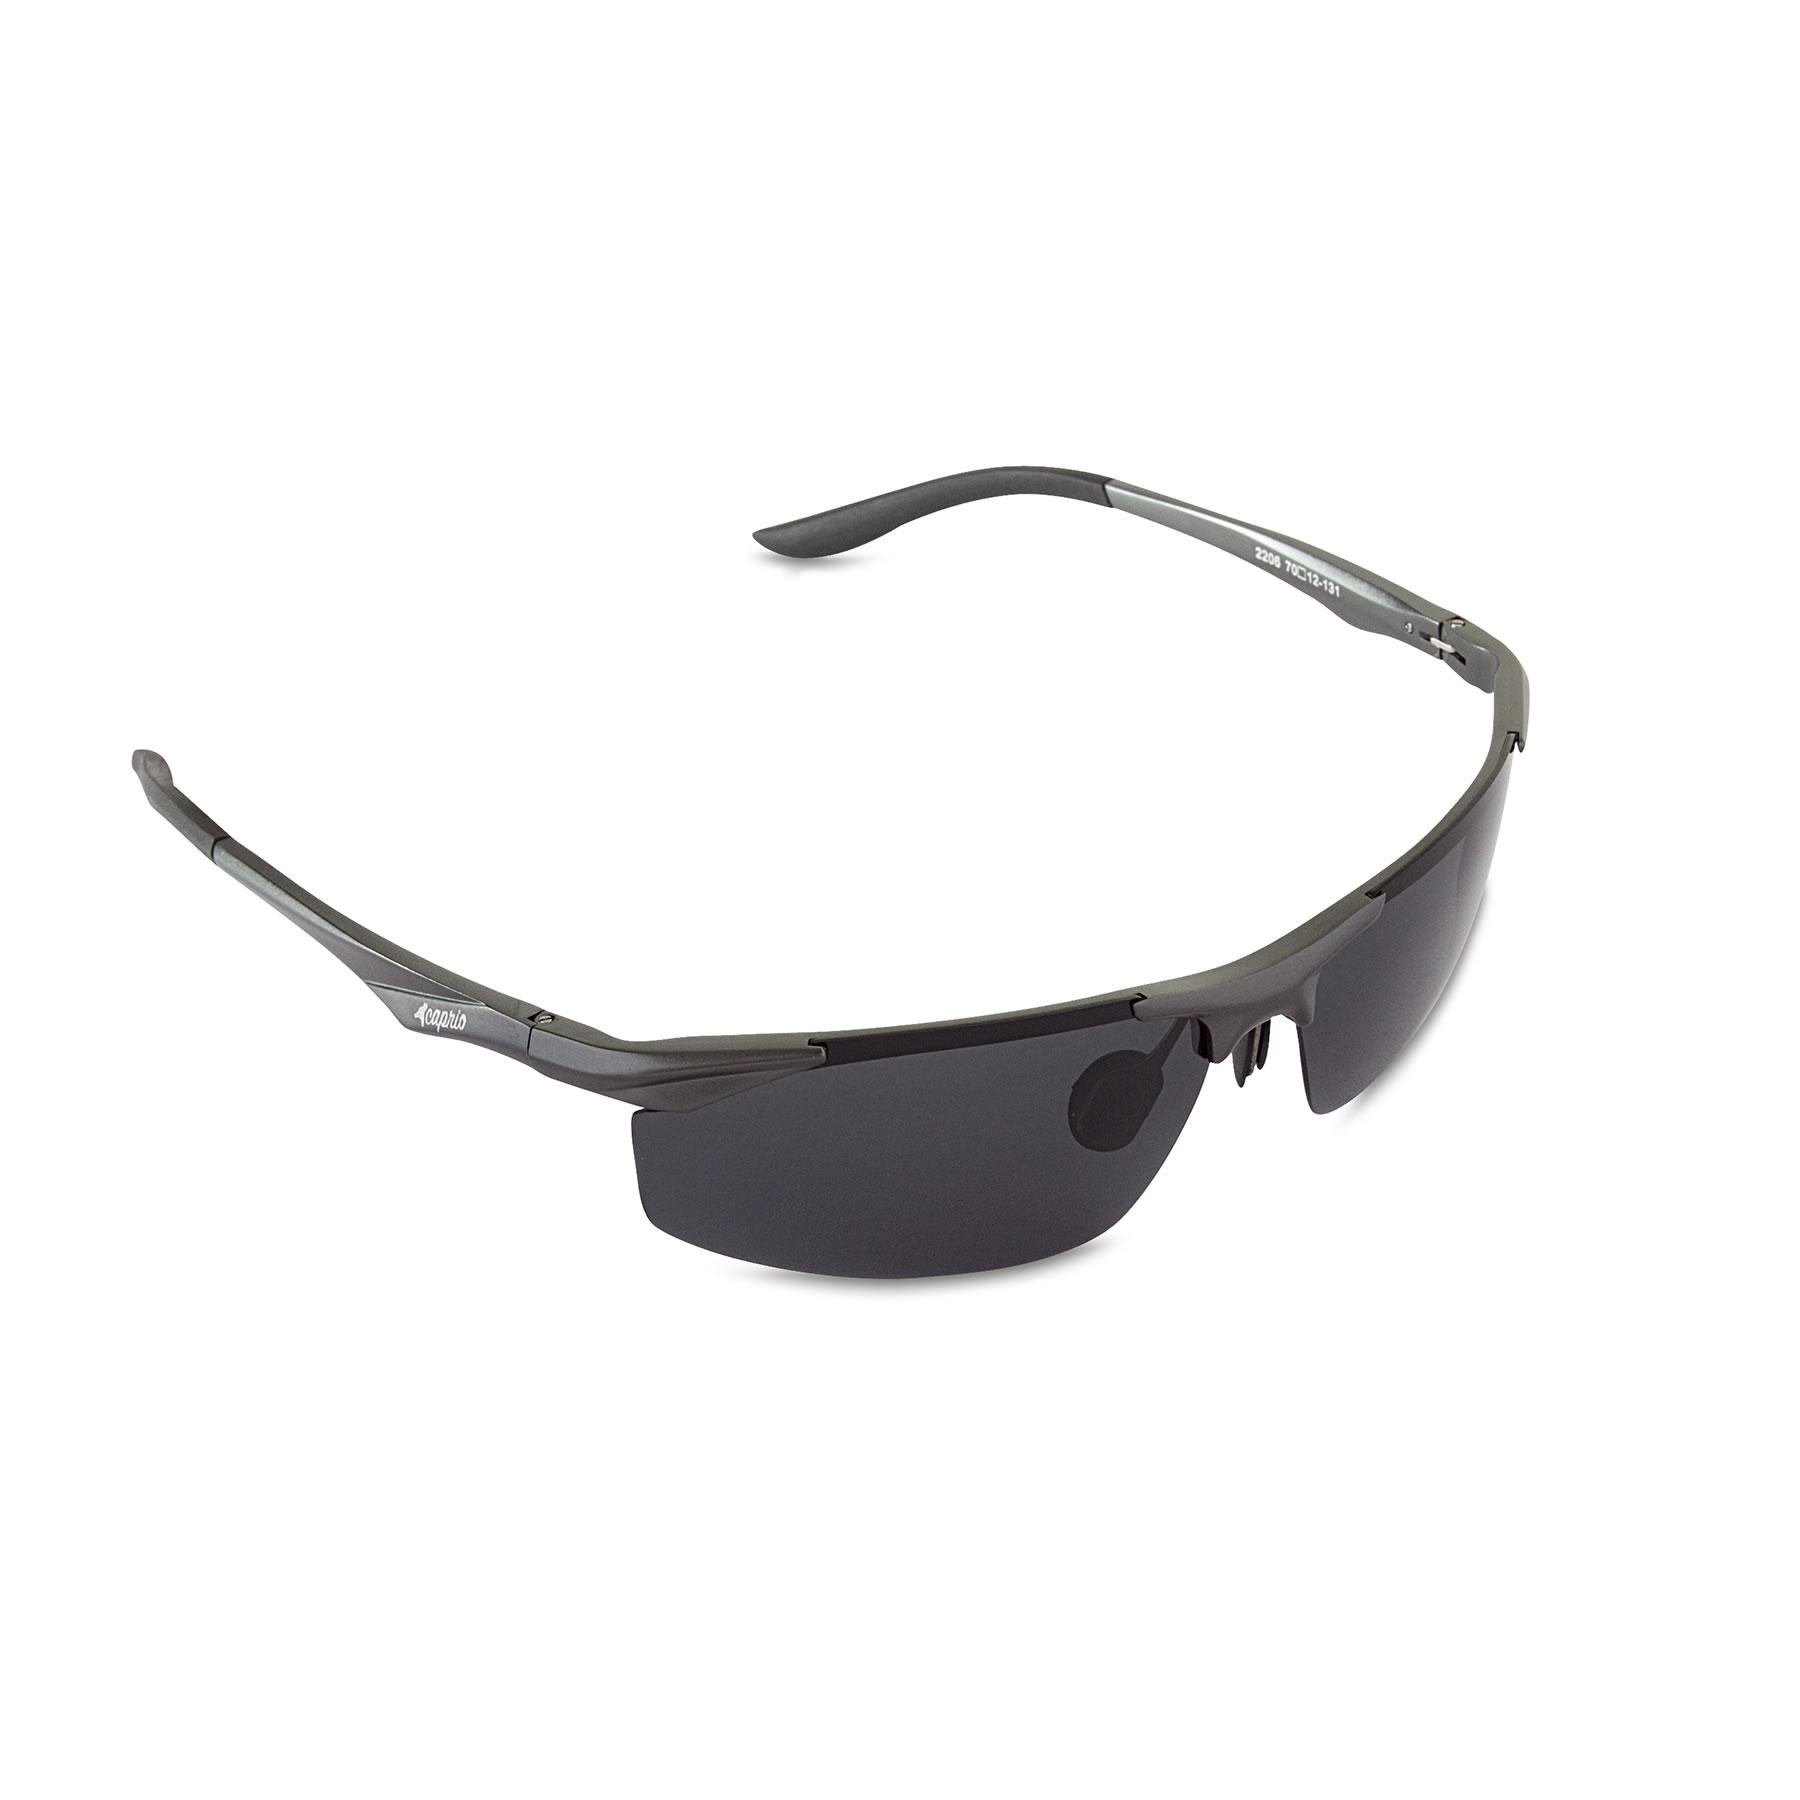 1e39c82923f7 Caprio Sleek Sports Sunglasses for Men